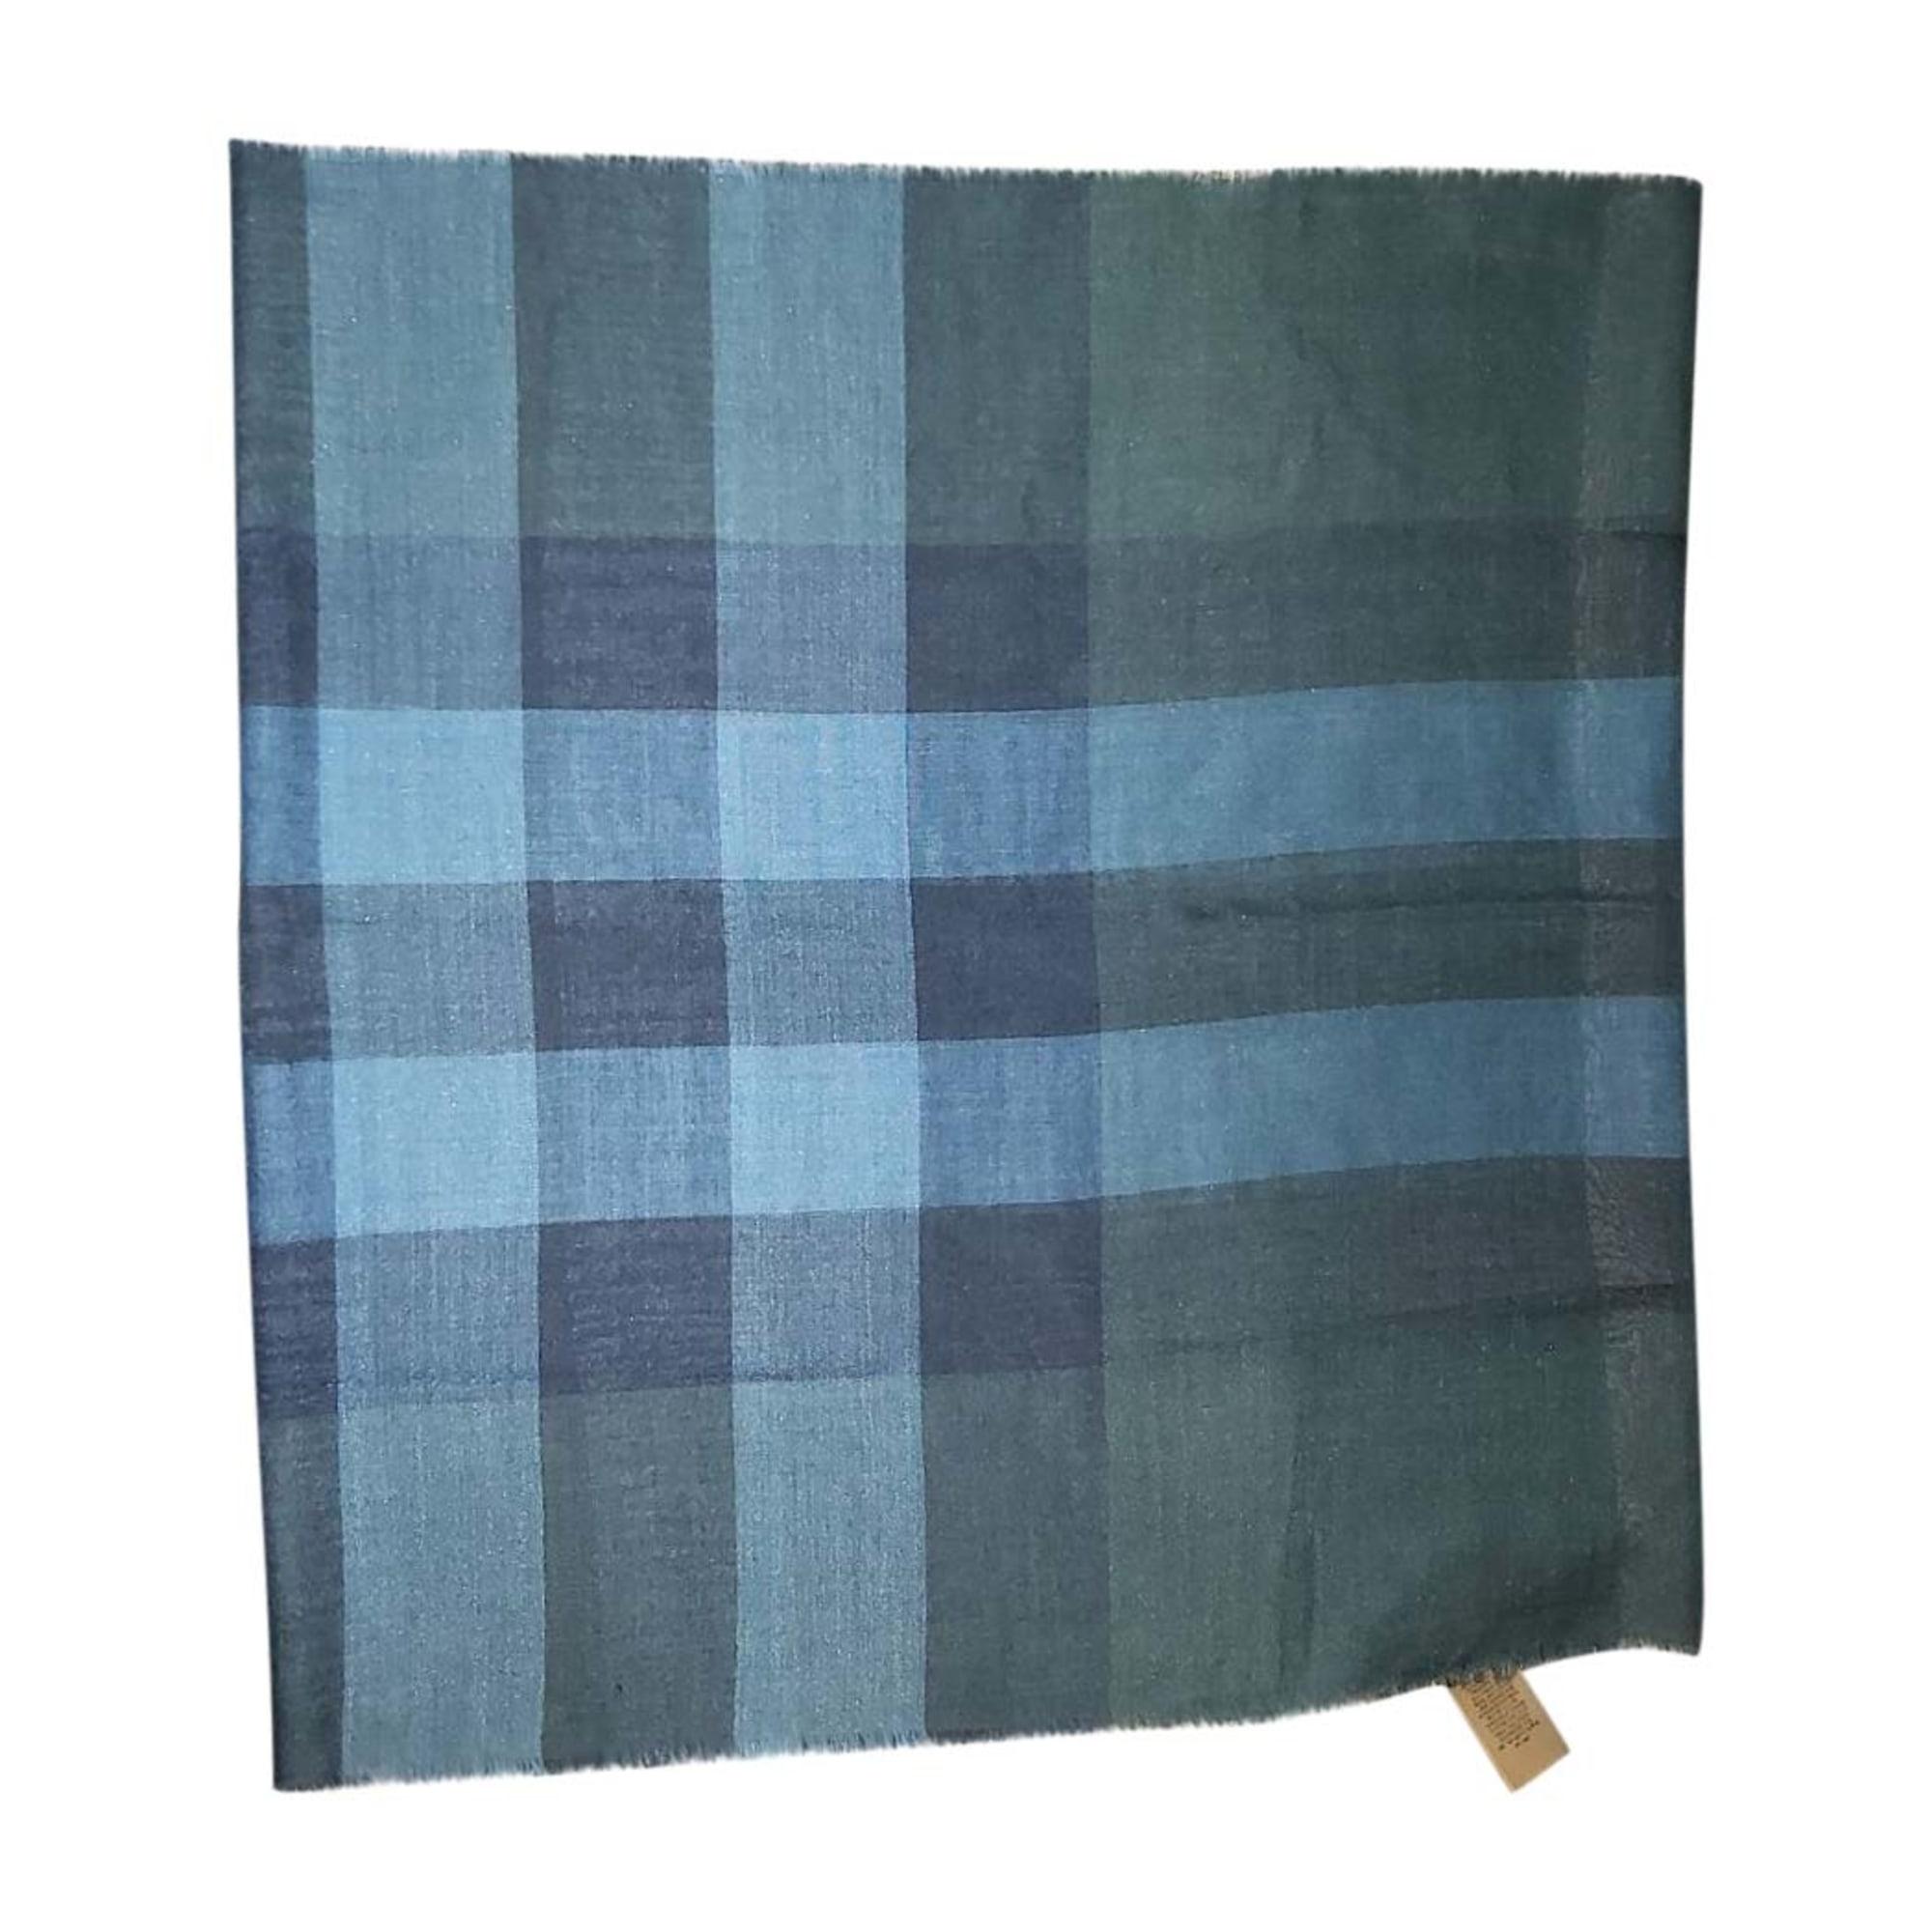 Echarpe BURBERRY Bleu, bleu marine, bleu turquoise